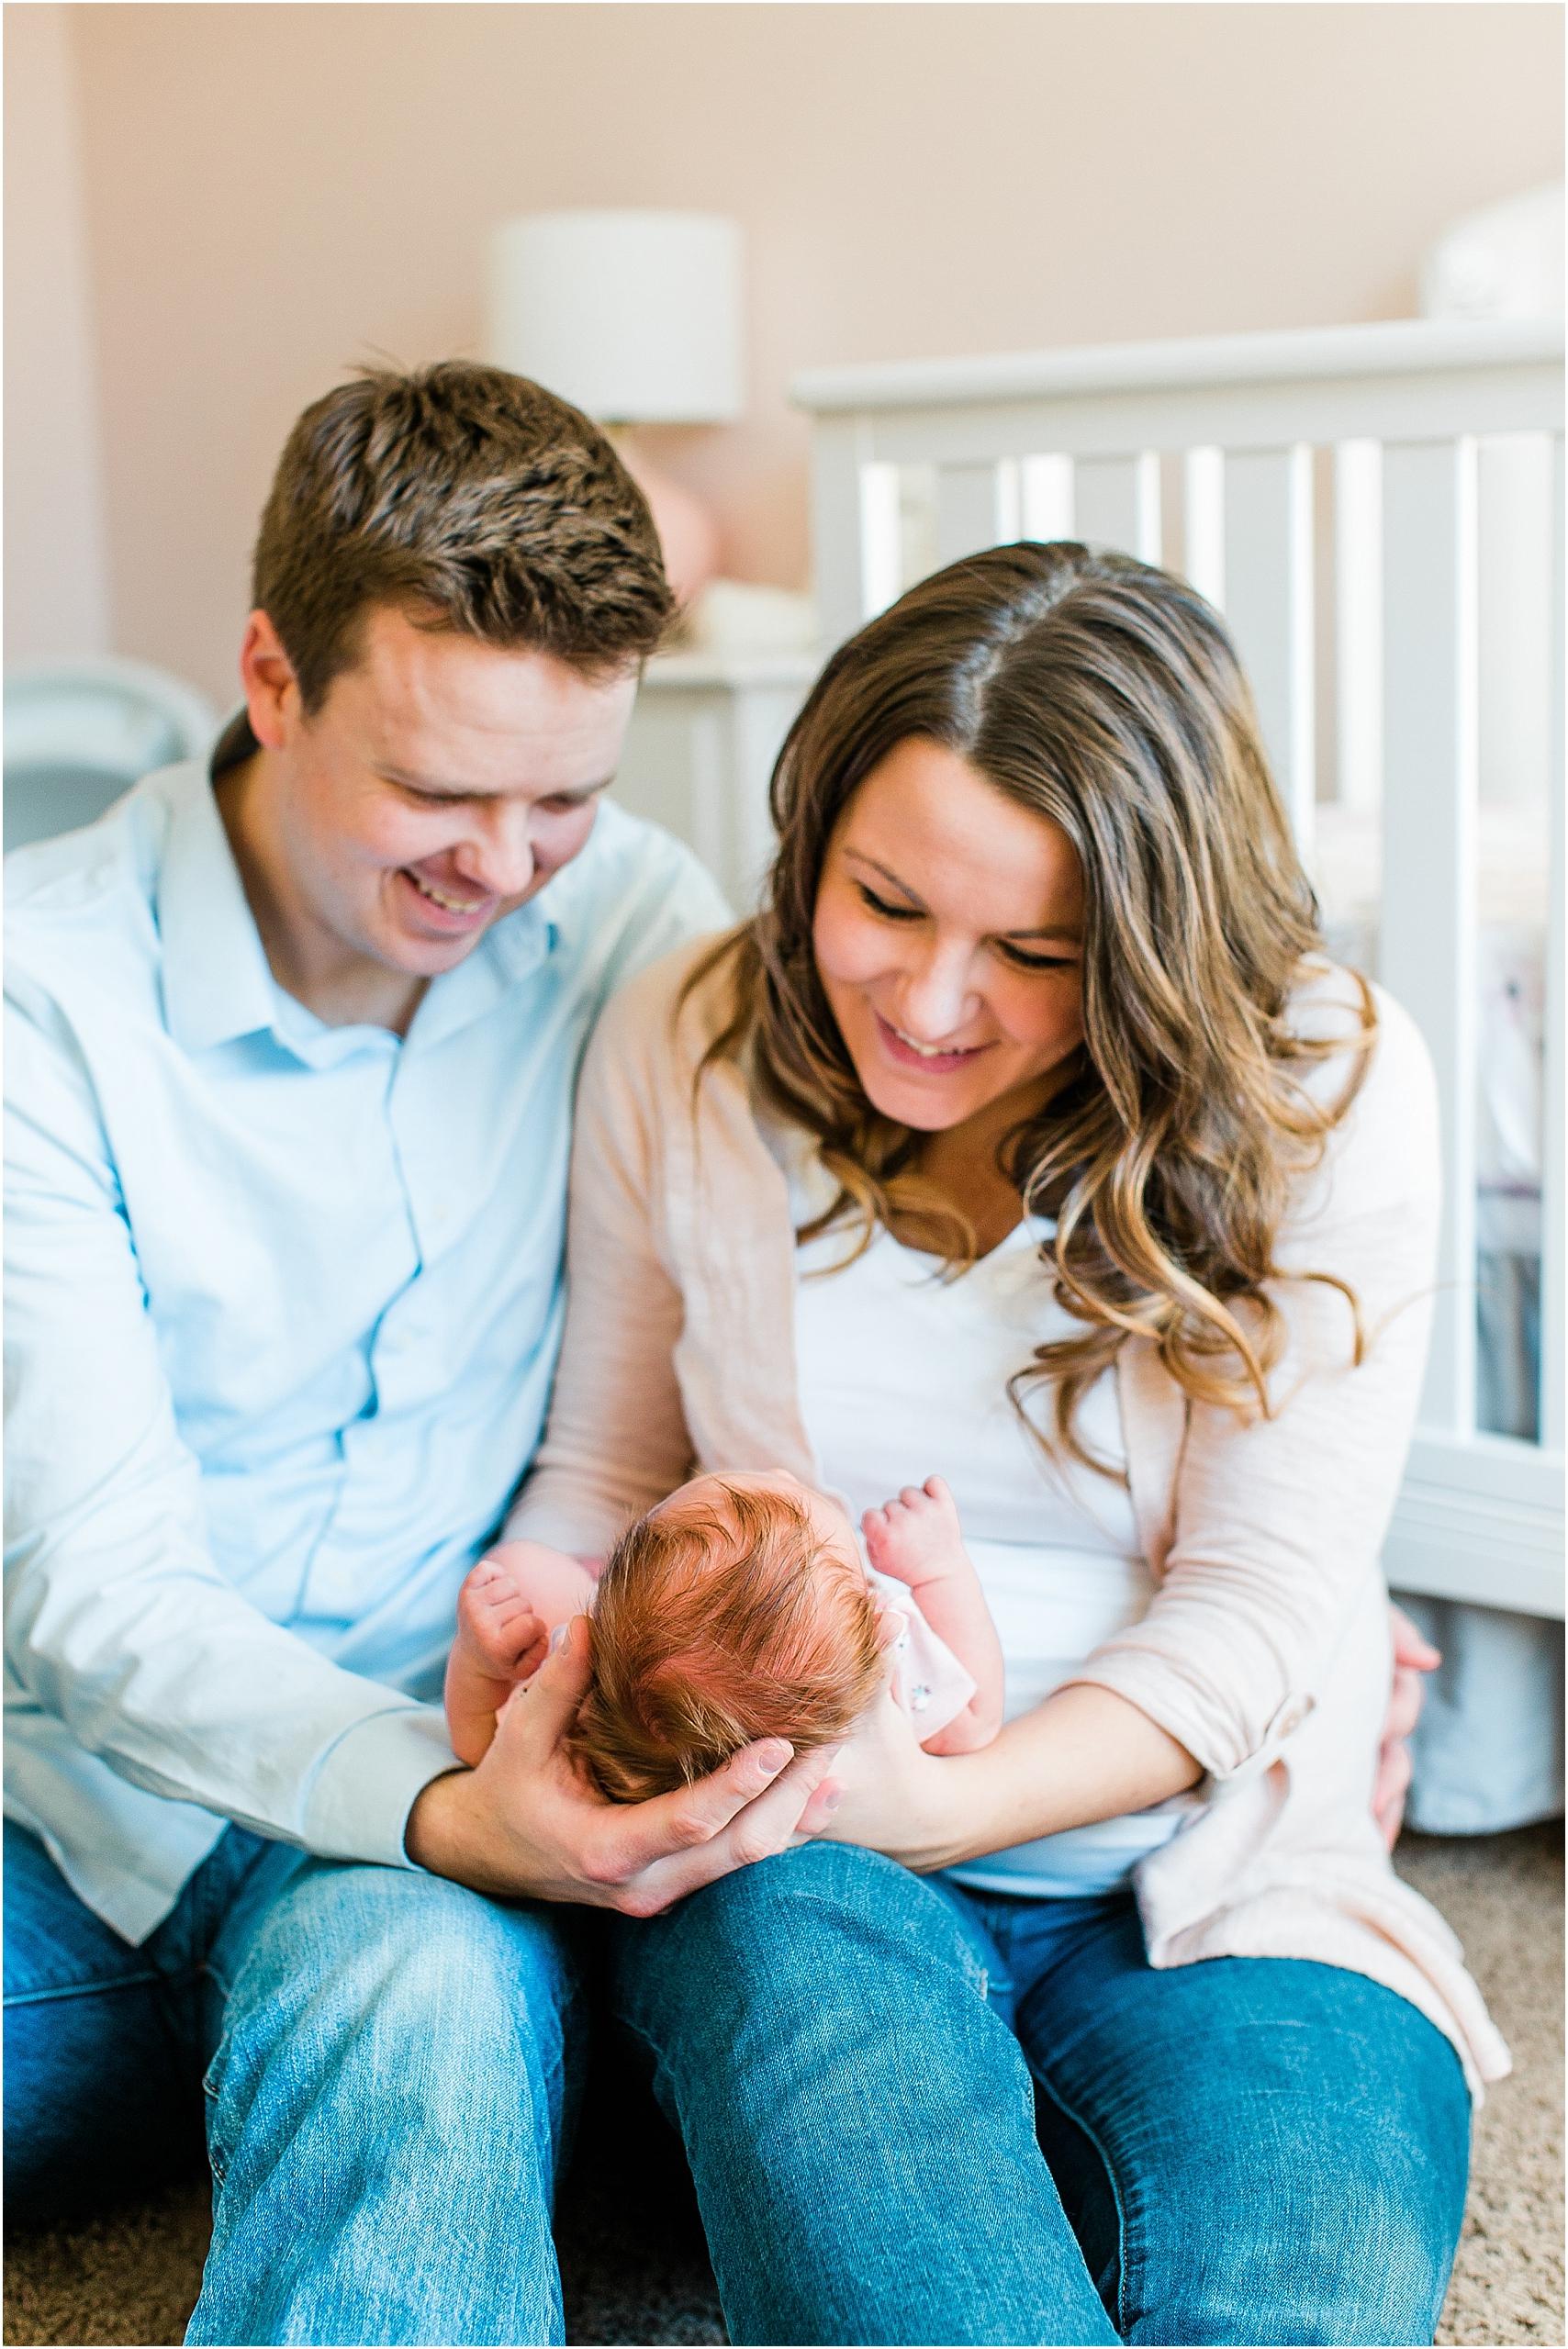 Minnesota Lifestyle In Home Newborn Photography Session Eagan Newborn Photography_0033.jpg